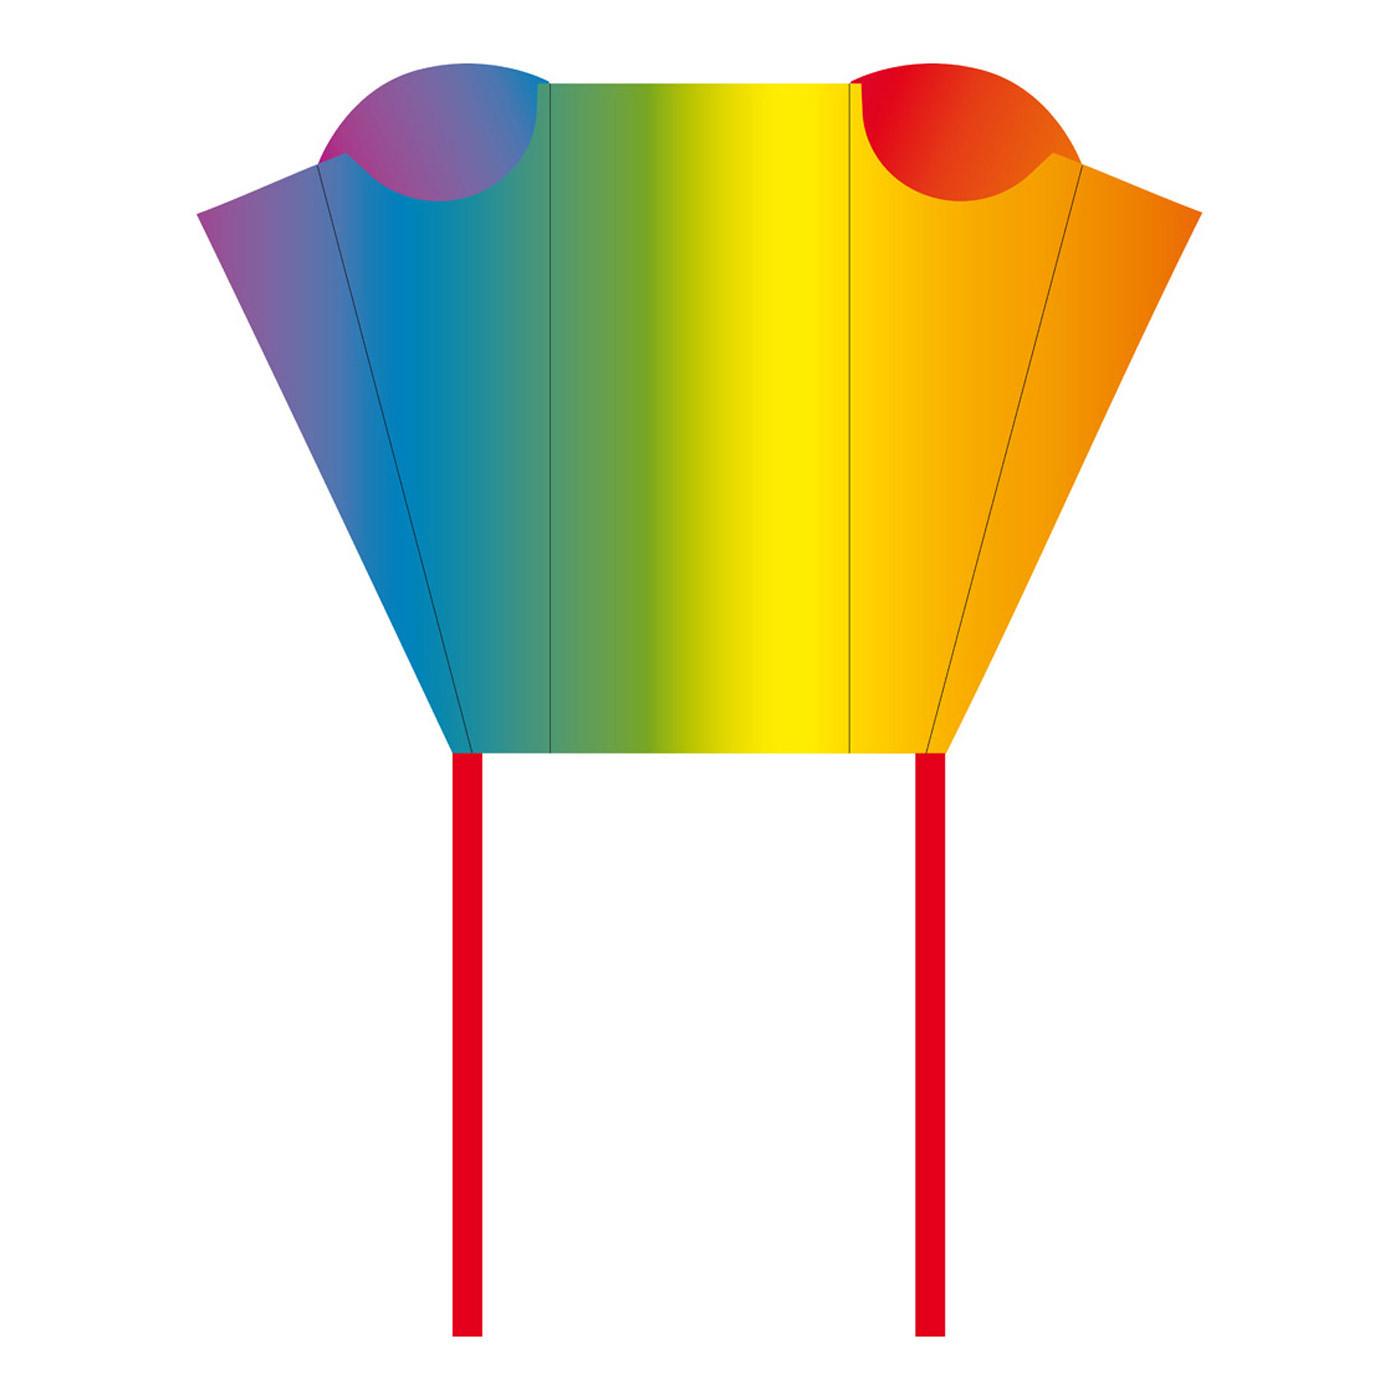 Pocket sled rainbow kite wind designs for Indoor kite design